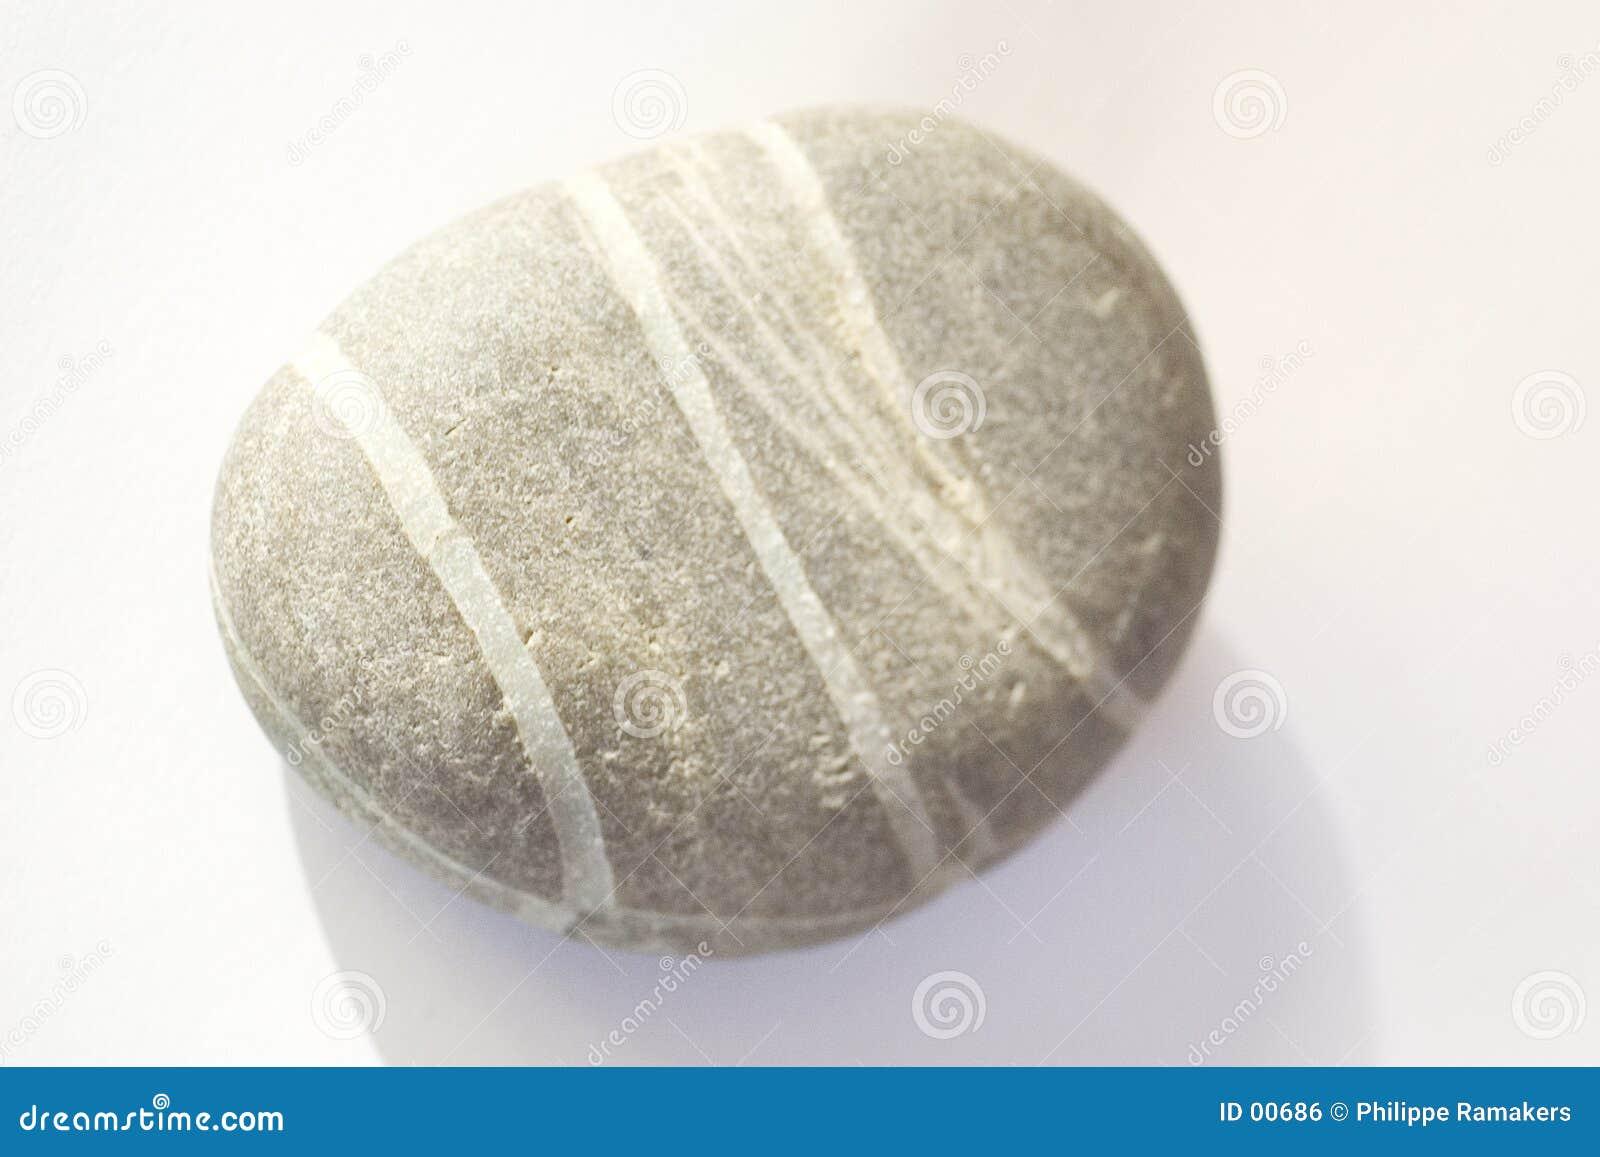 Kamień.